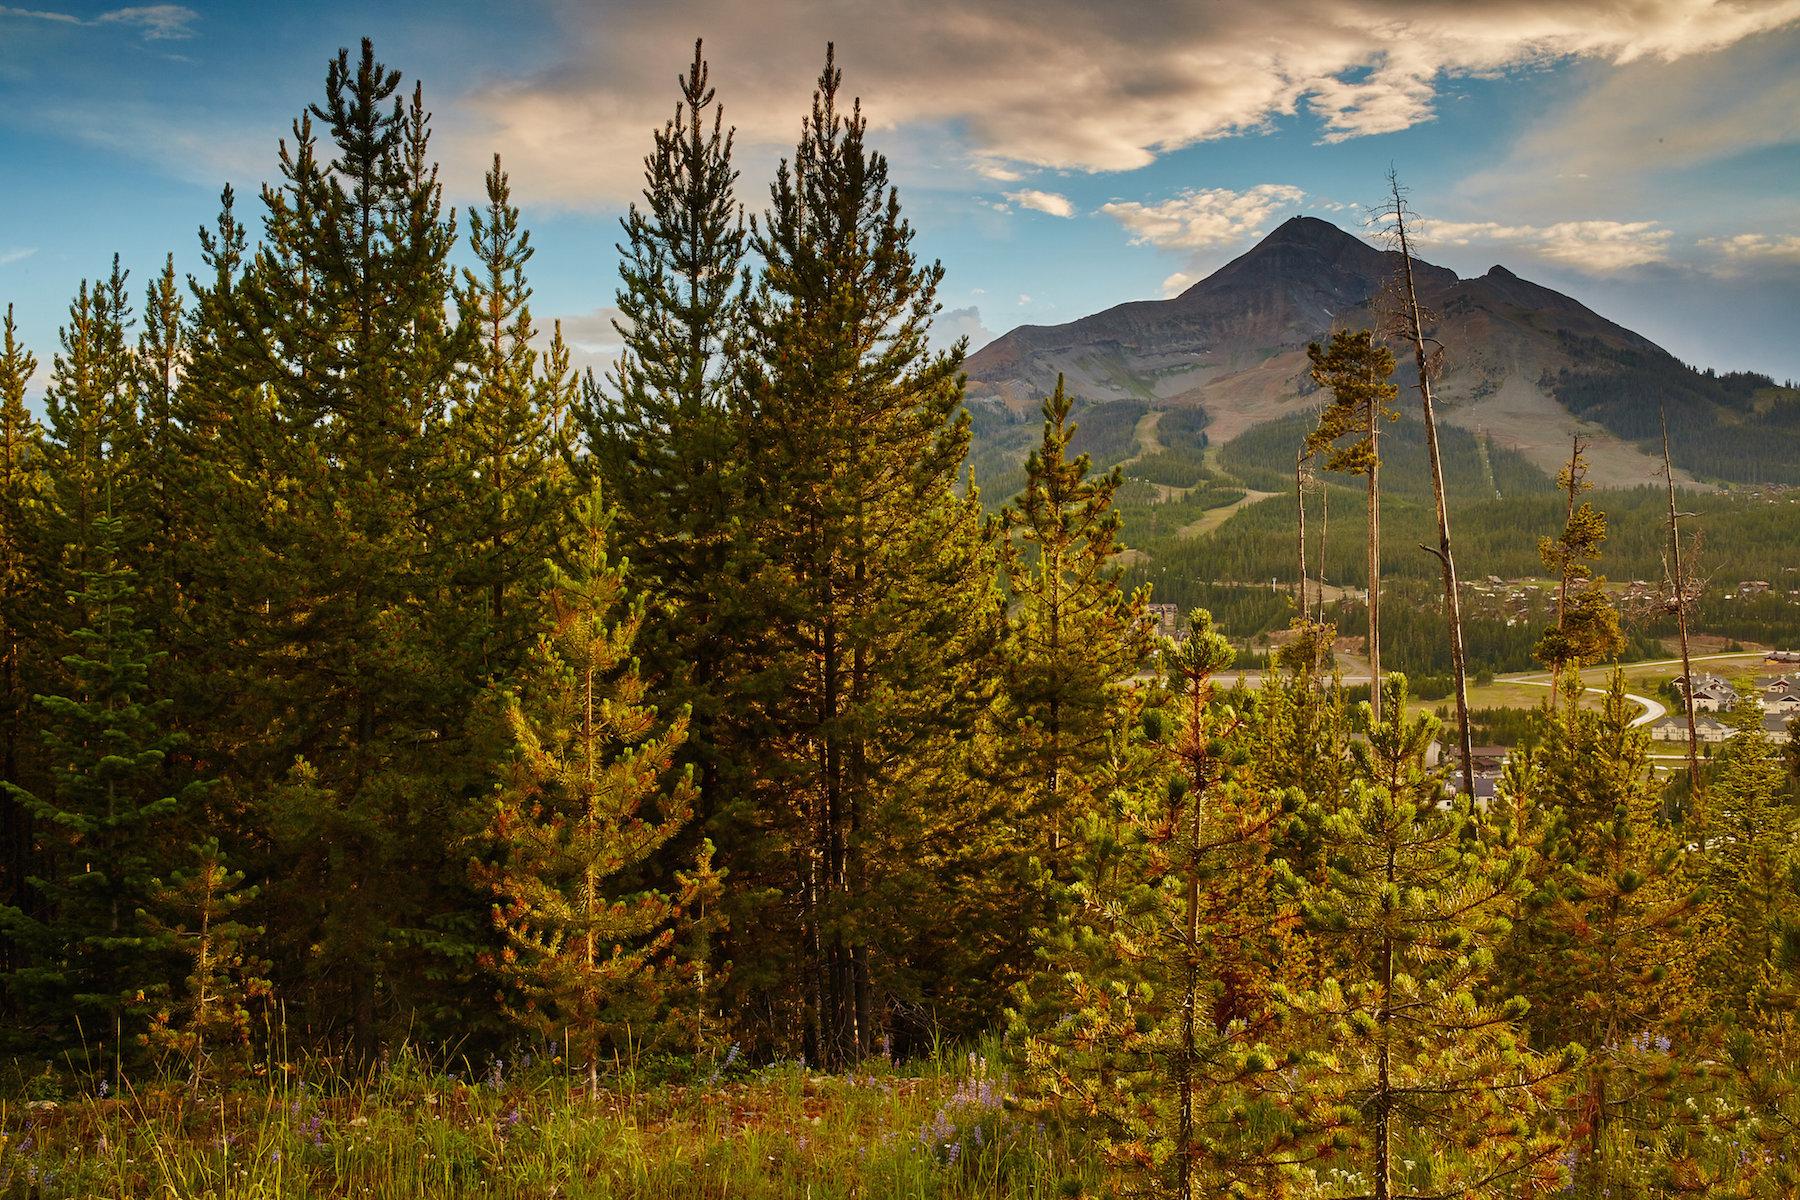 Terreno para Venda às Summit View Homesite Summit View Drive, Ph 1, Lot 3 Big Sky, Montana, 59716 Estados Unidos